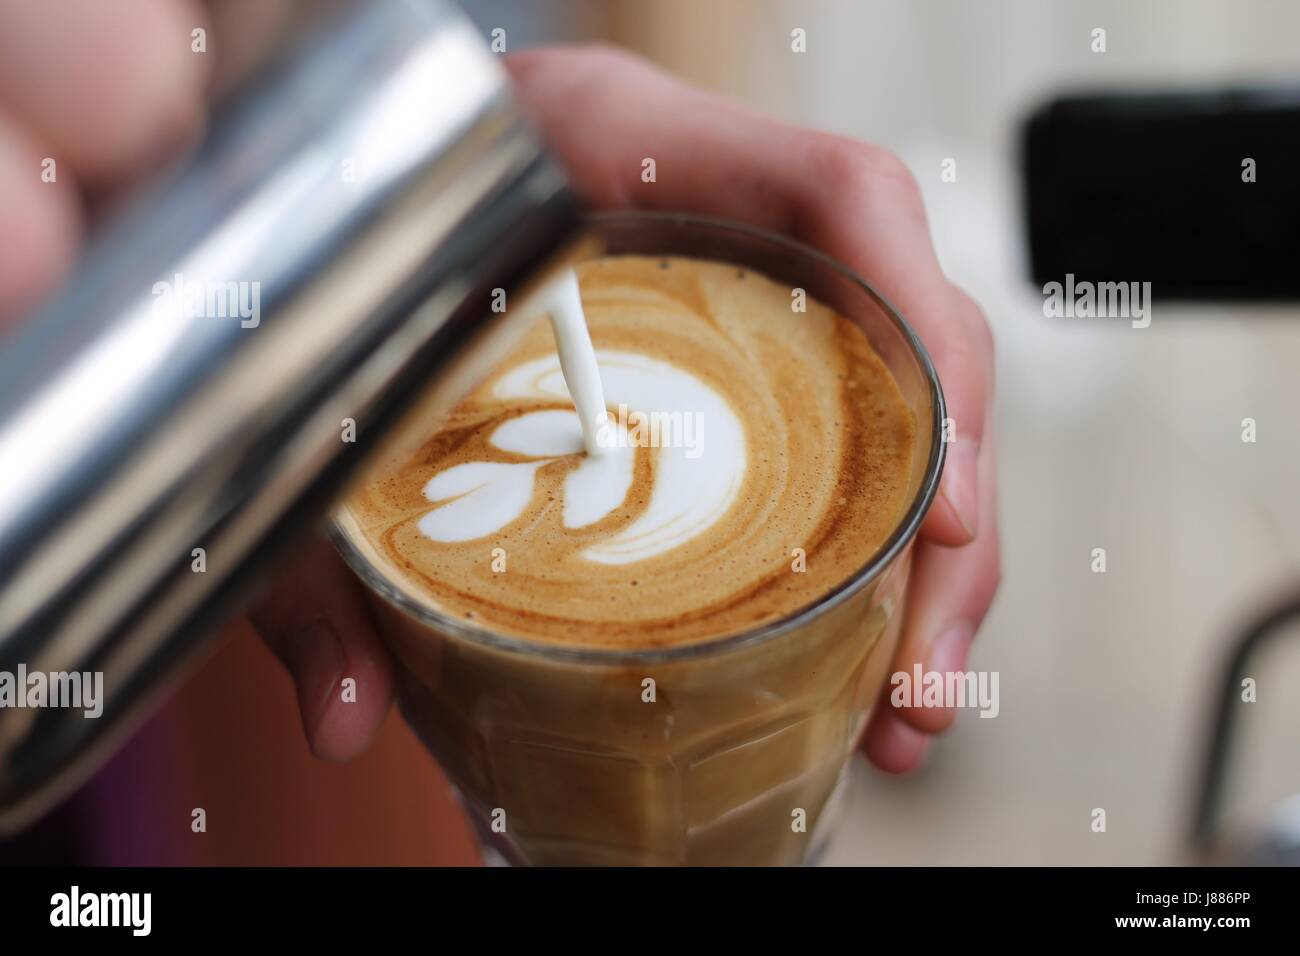 Latte art by Swedish barista - Stock Image